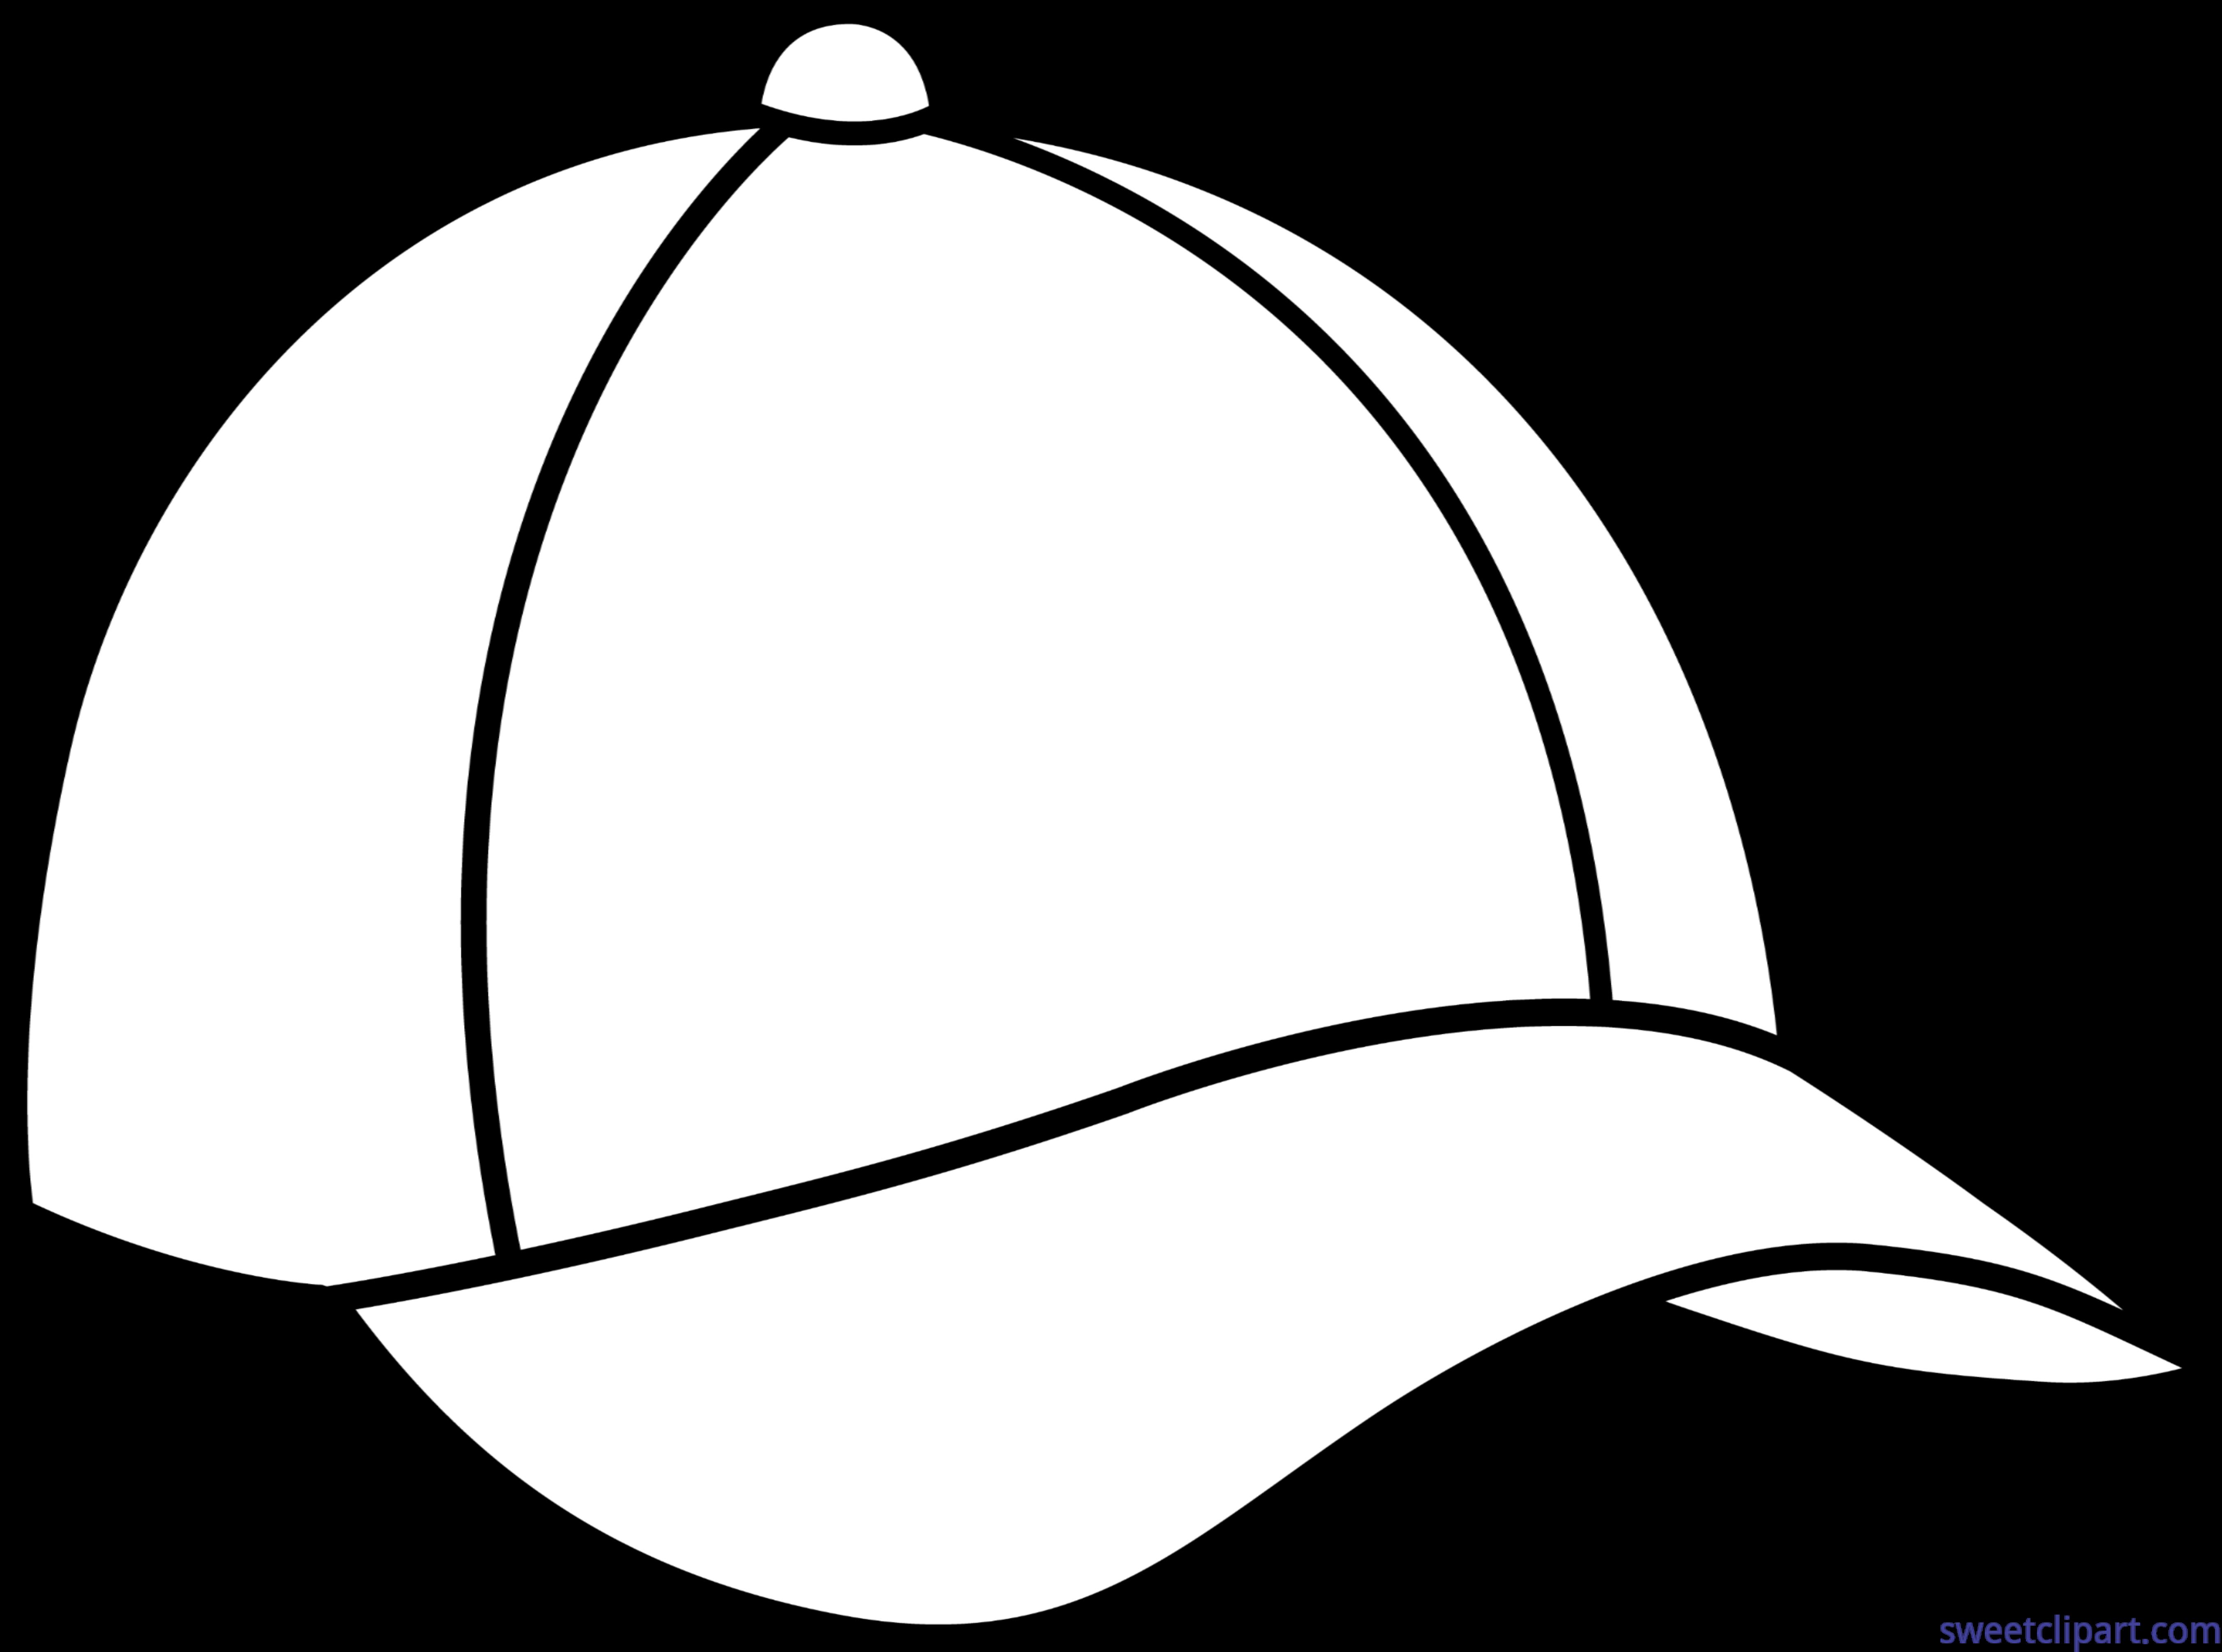 Baseball thread clipart image free stock Baseball Cap Lineart Clip Art - Sweet Clip Art image free stock